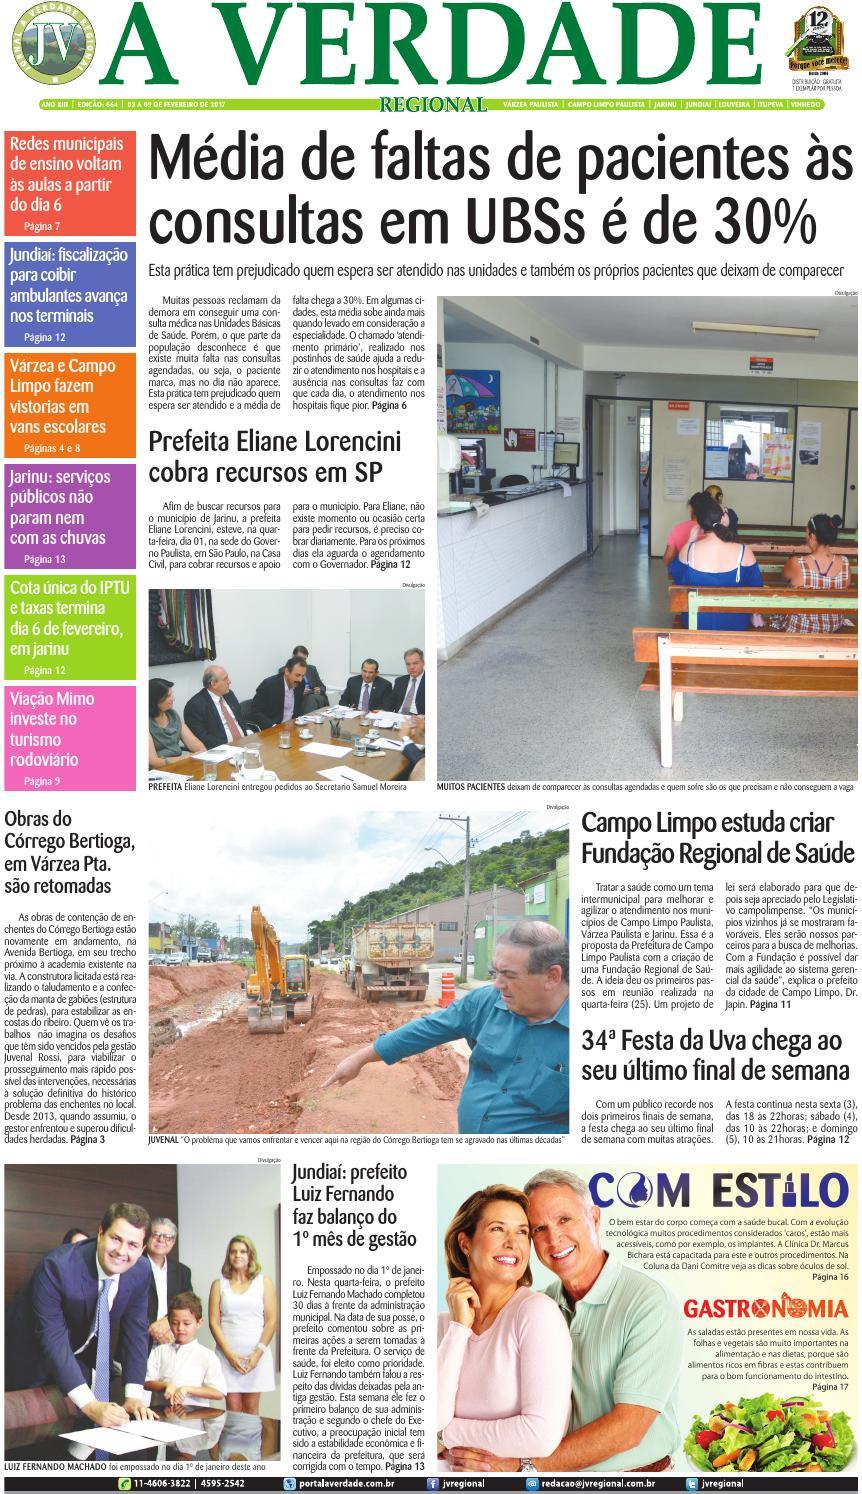 JV Regional ® - Edição 664 by Jornal A Verdade Regional - issuu 0378d7c0d4